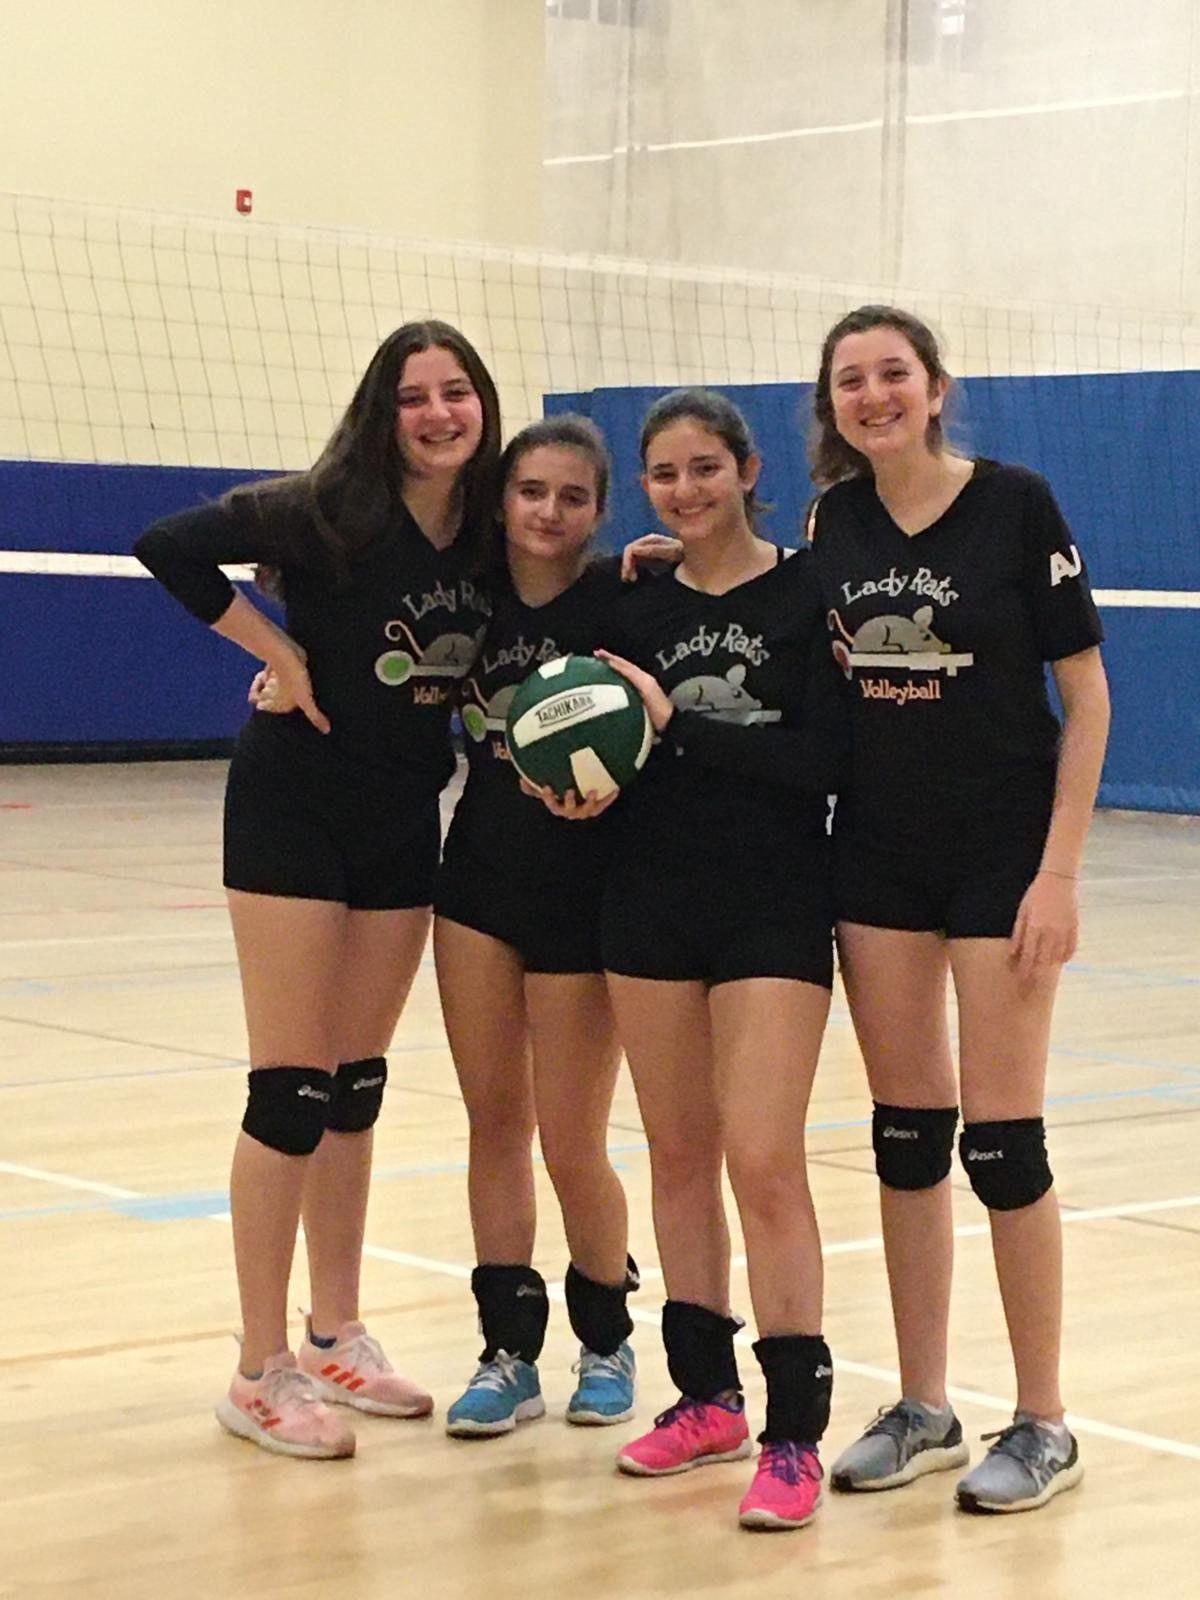 2019 Girls Volleyball season & Championships